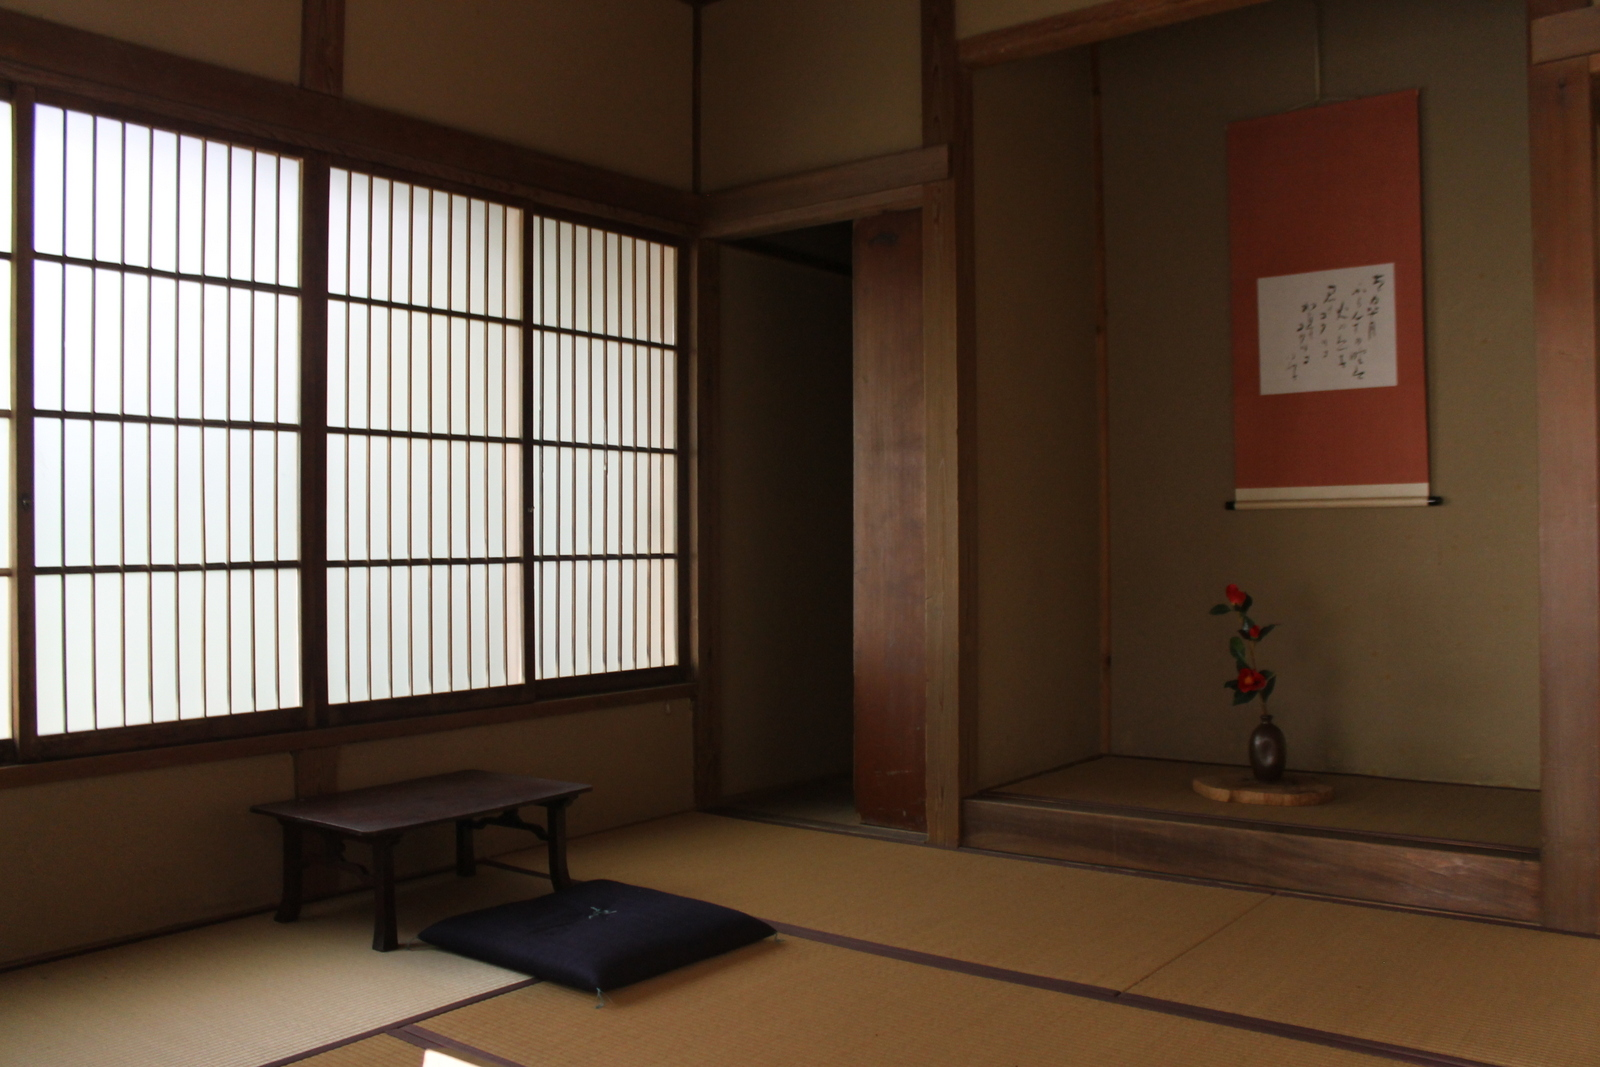 maison chinoise traditionnelle interieur. Black Bedroom Furniture Sets. Home Design Ideas